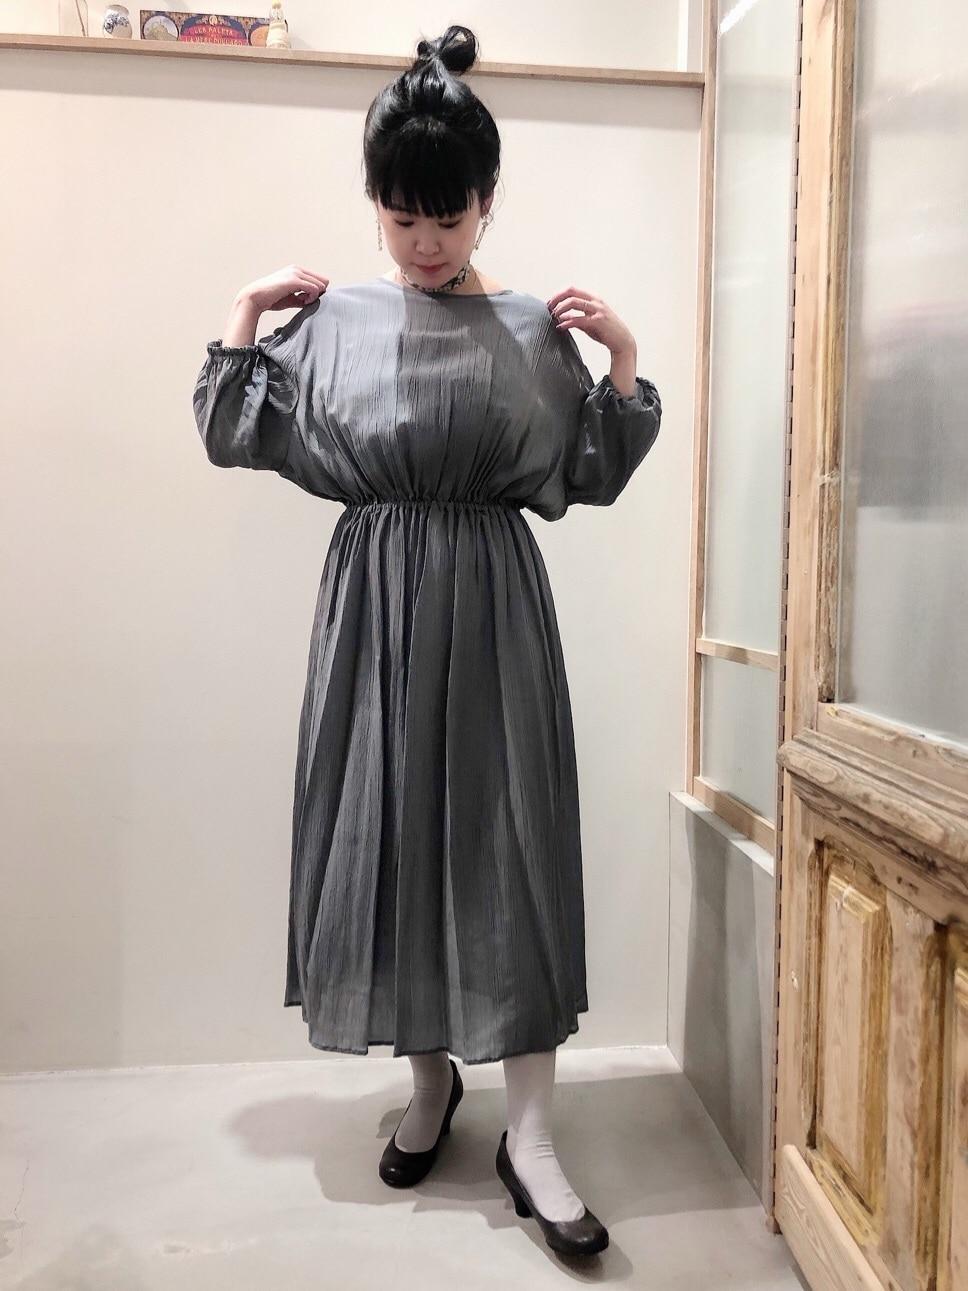 bulle de savon 渋谷スクランブルスクエア 身長:158cm 2020.08.01